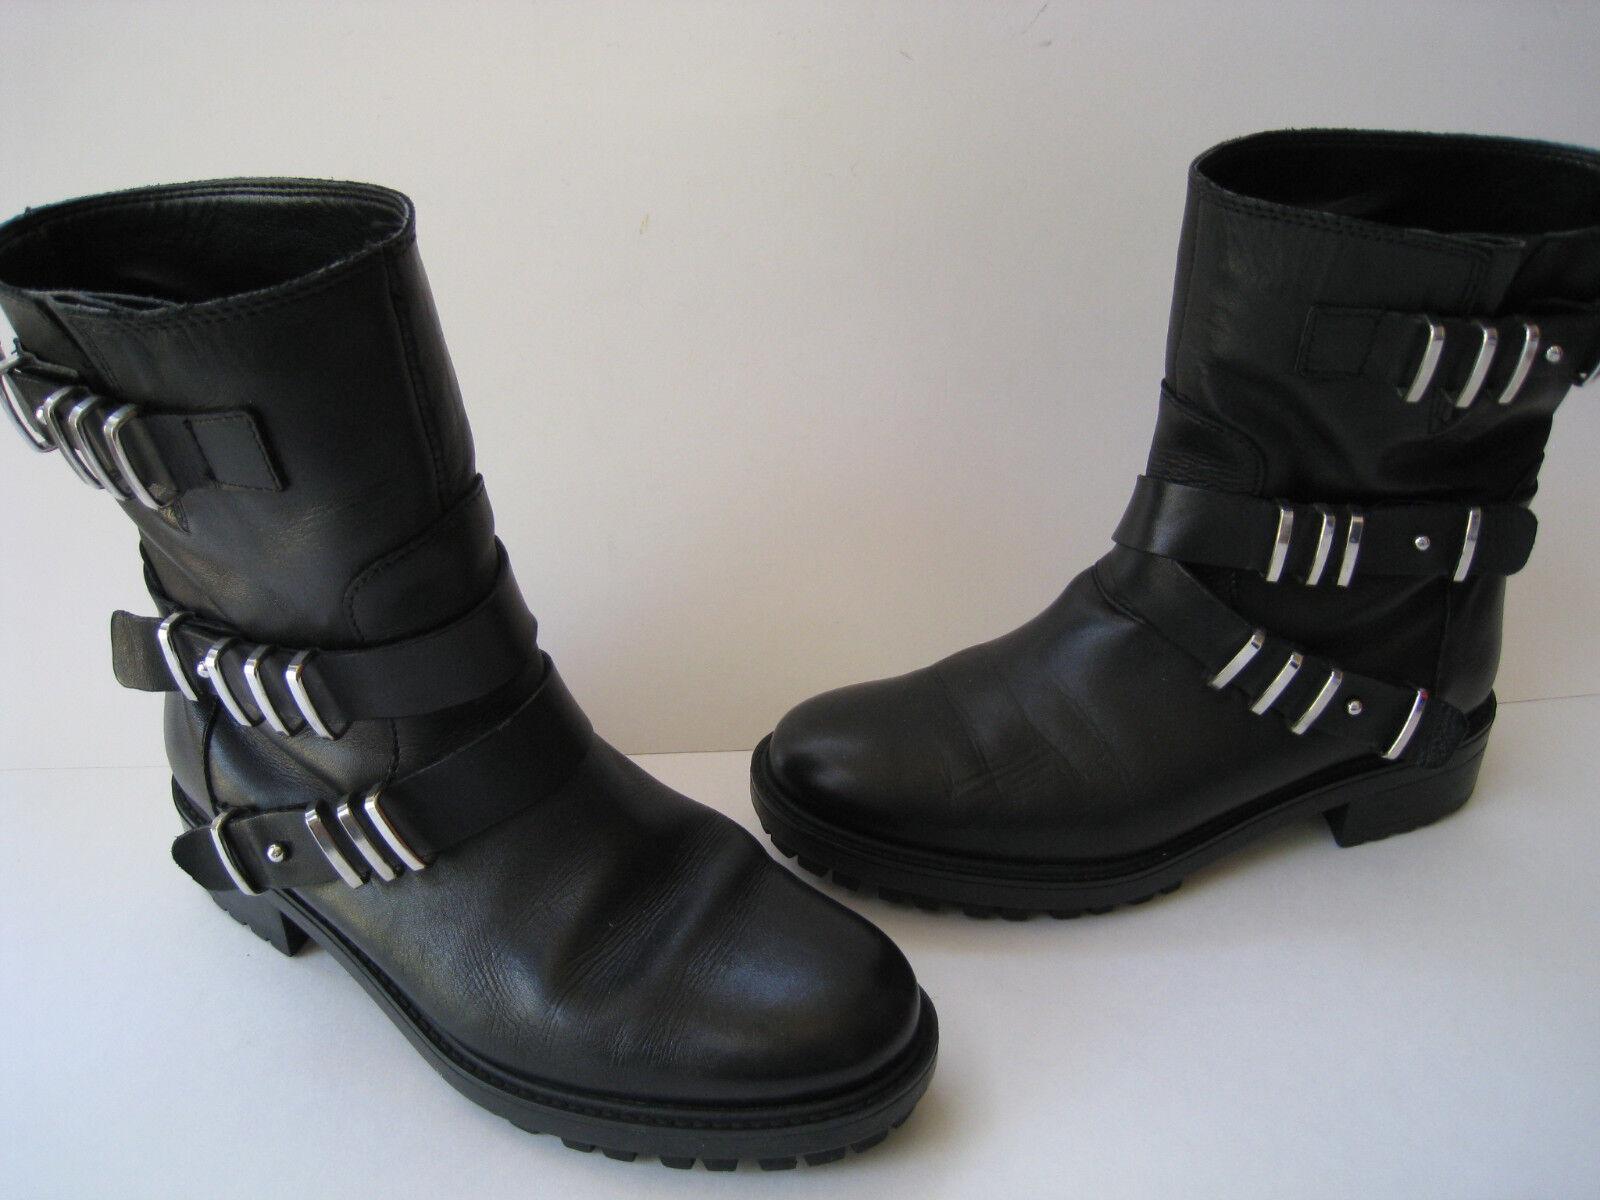 ZARA Damenschuhe BLACK LEATHER BIKER ANKLE METAL TRIM Stiefel WOMEN US 6  EUR 36 HOT